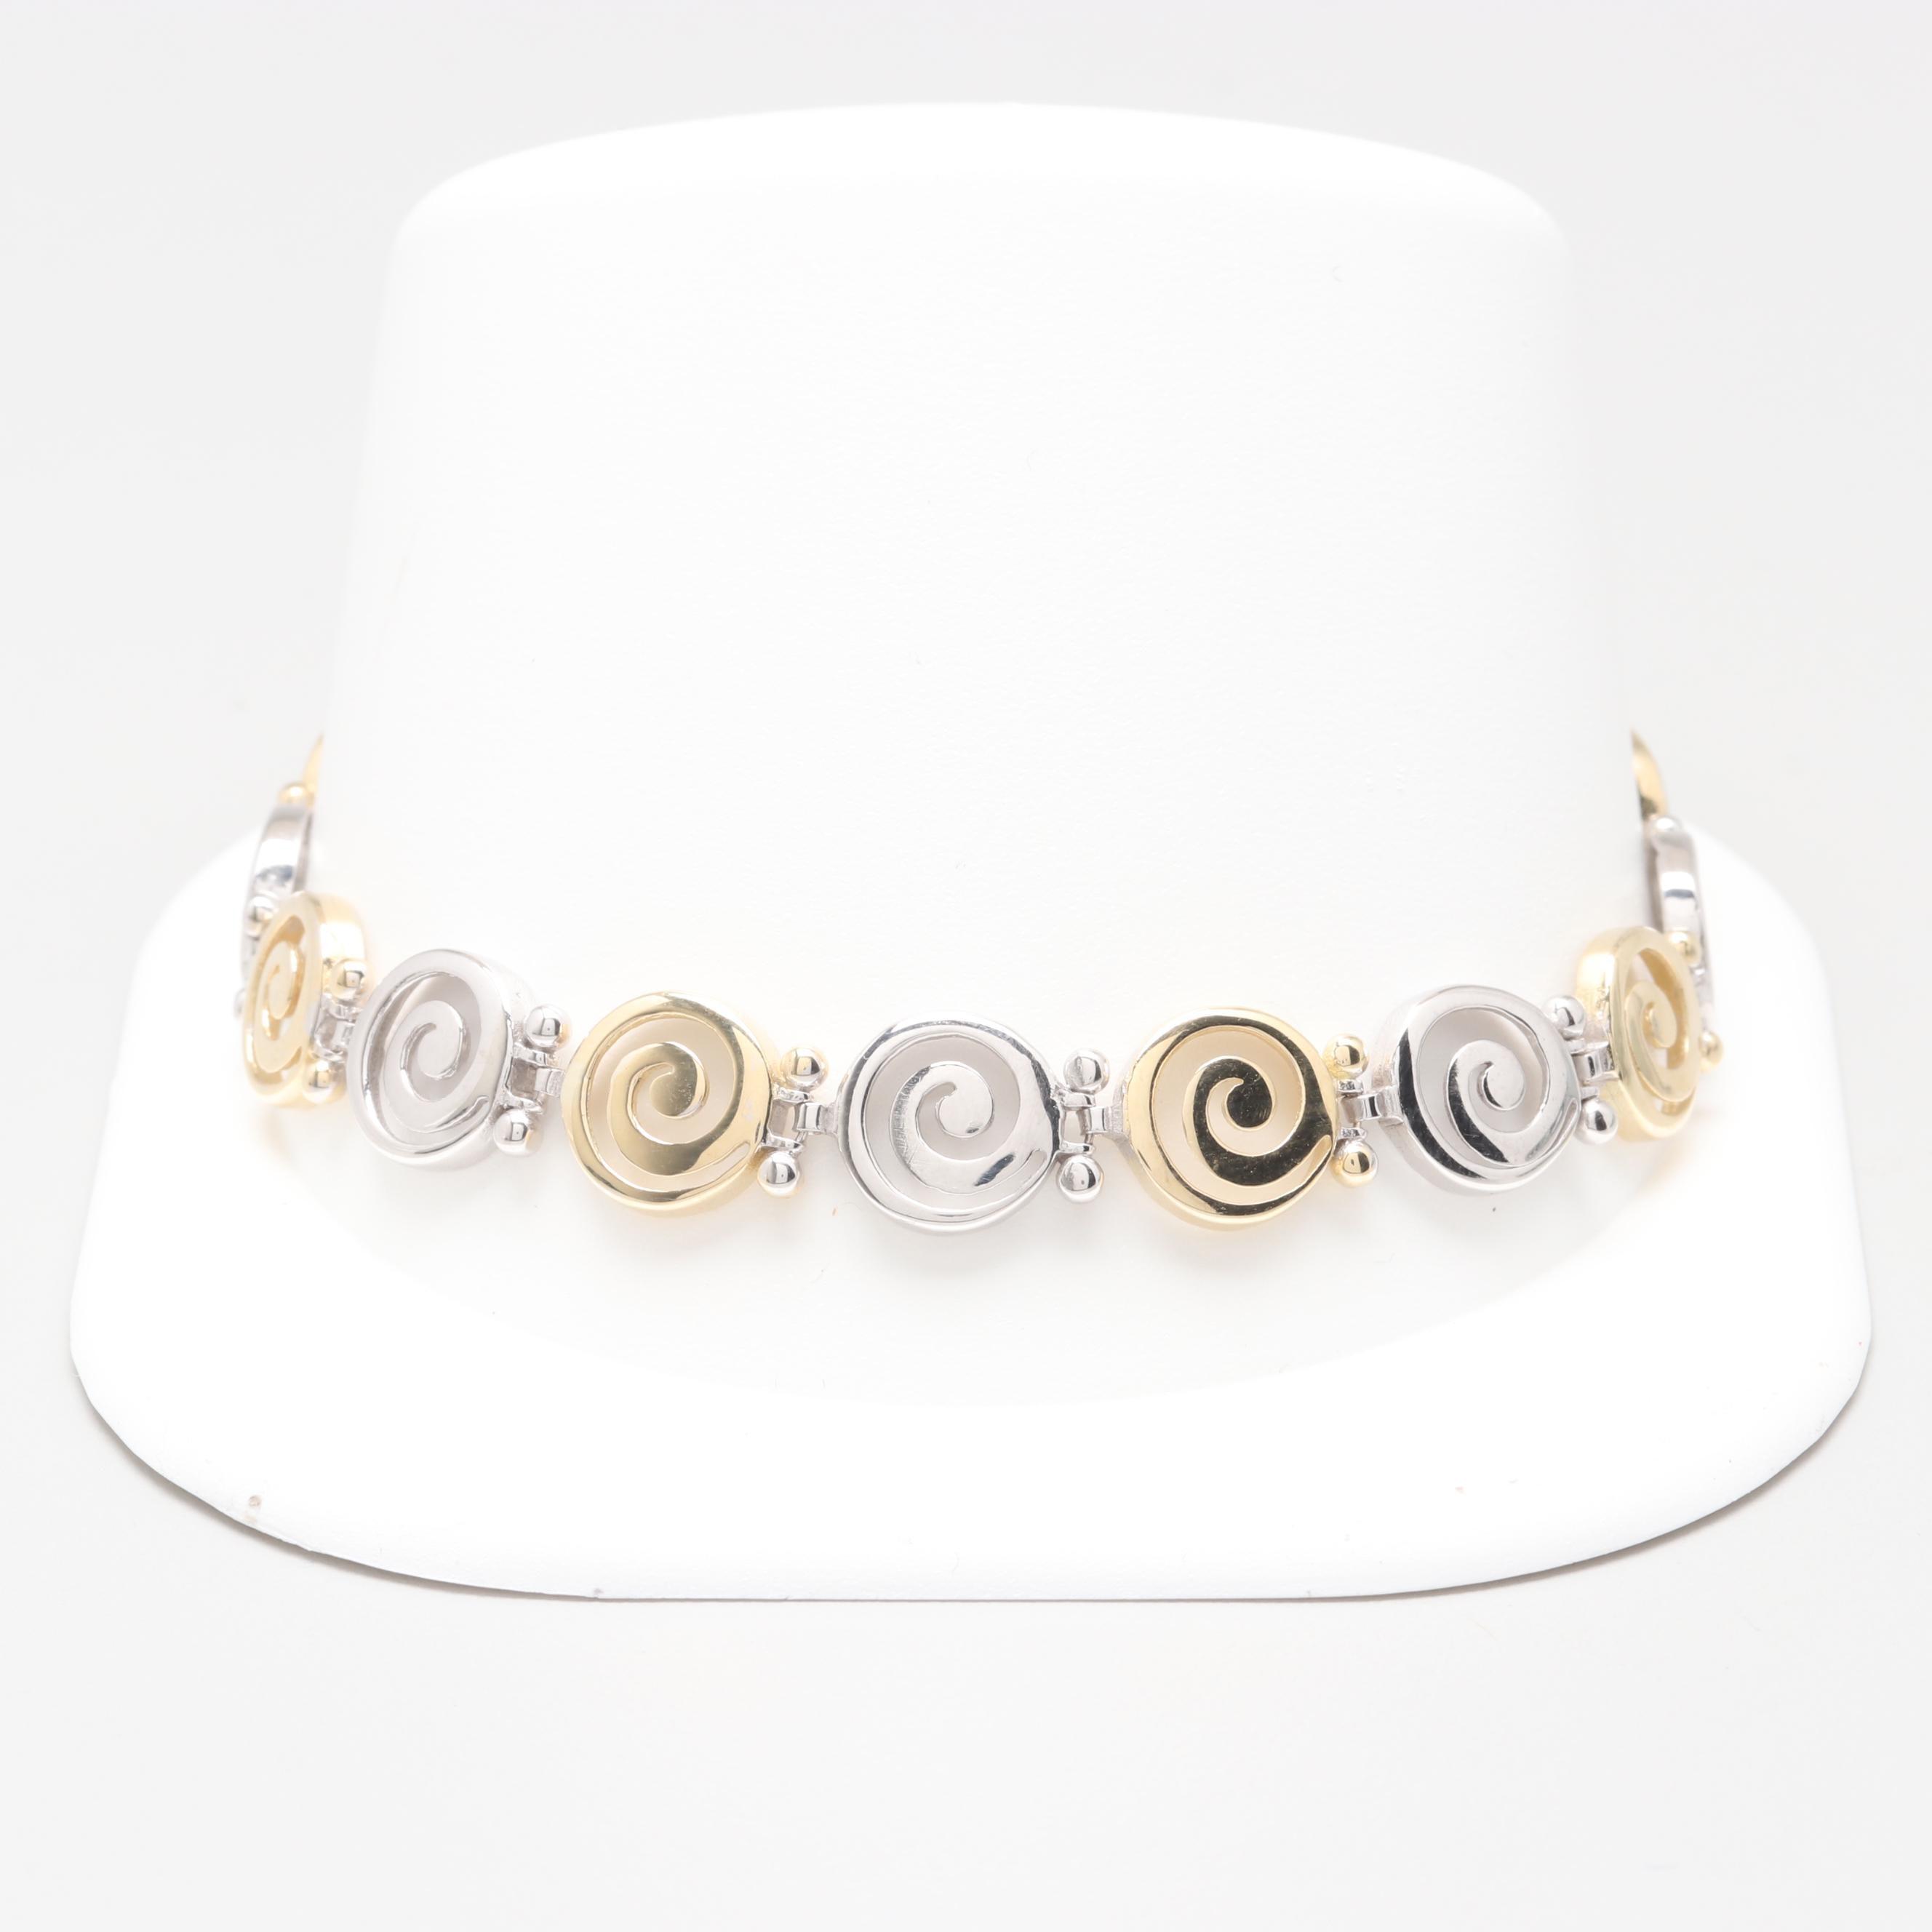 14K Yellow and White Gold Swirl Link Bracelet